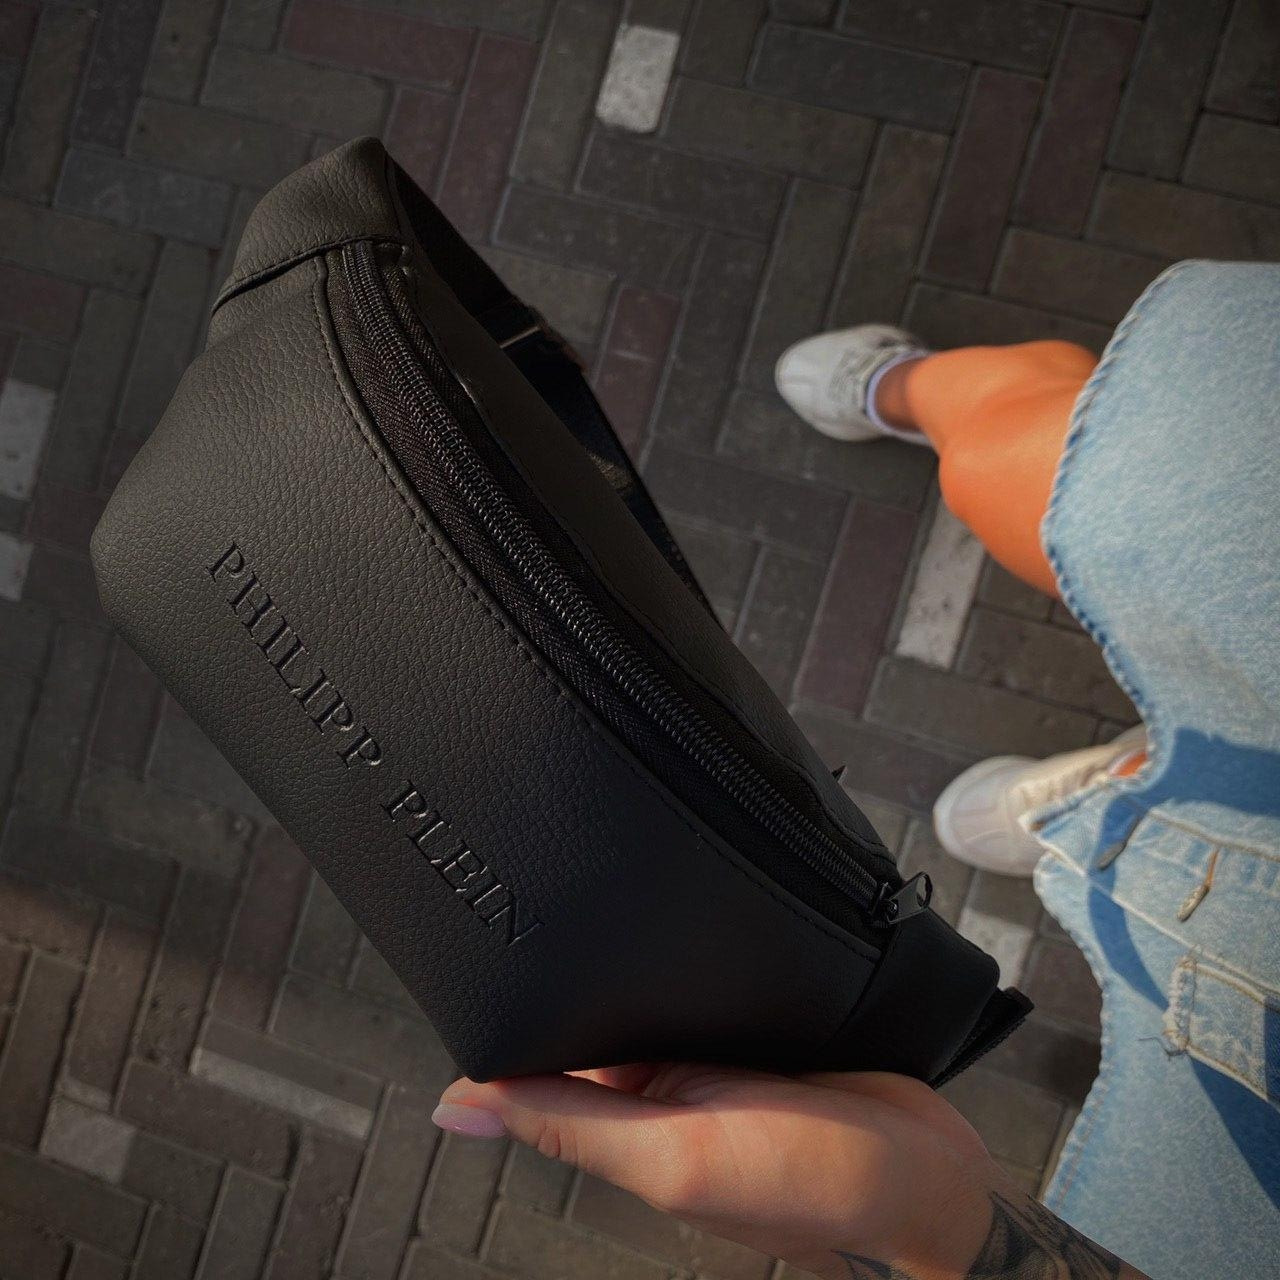 Бананка Мужская   Женская Philipp Plein черная black сумка на пояс с логотипом